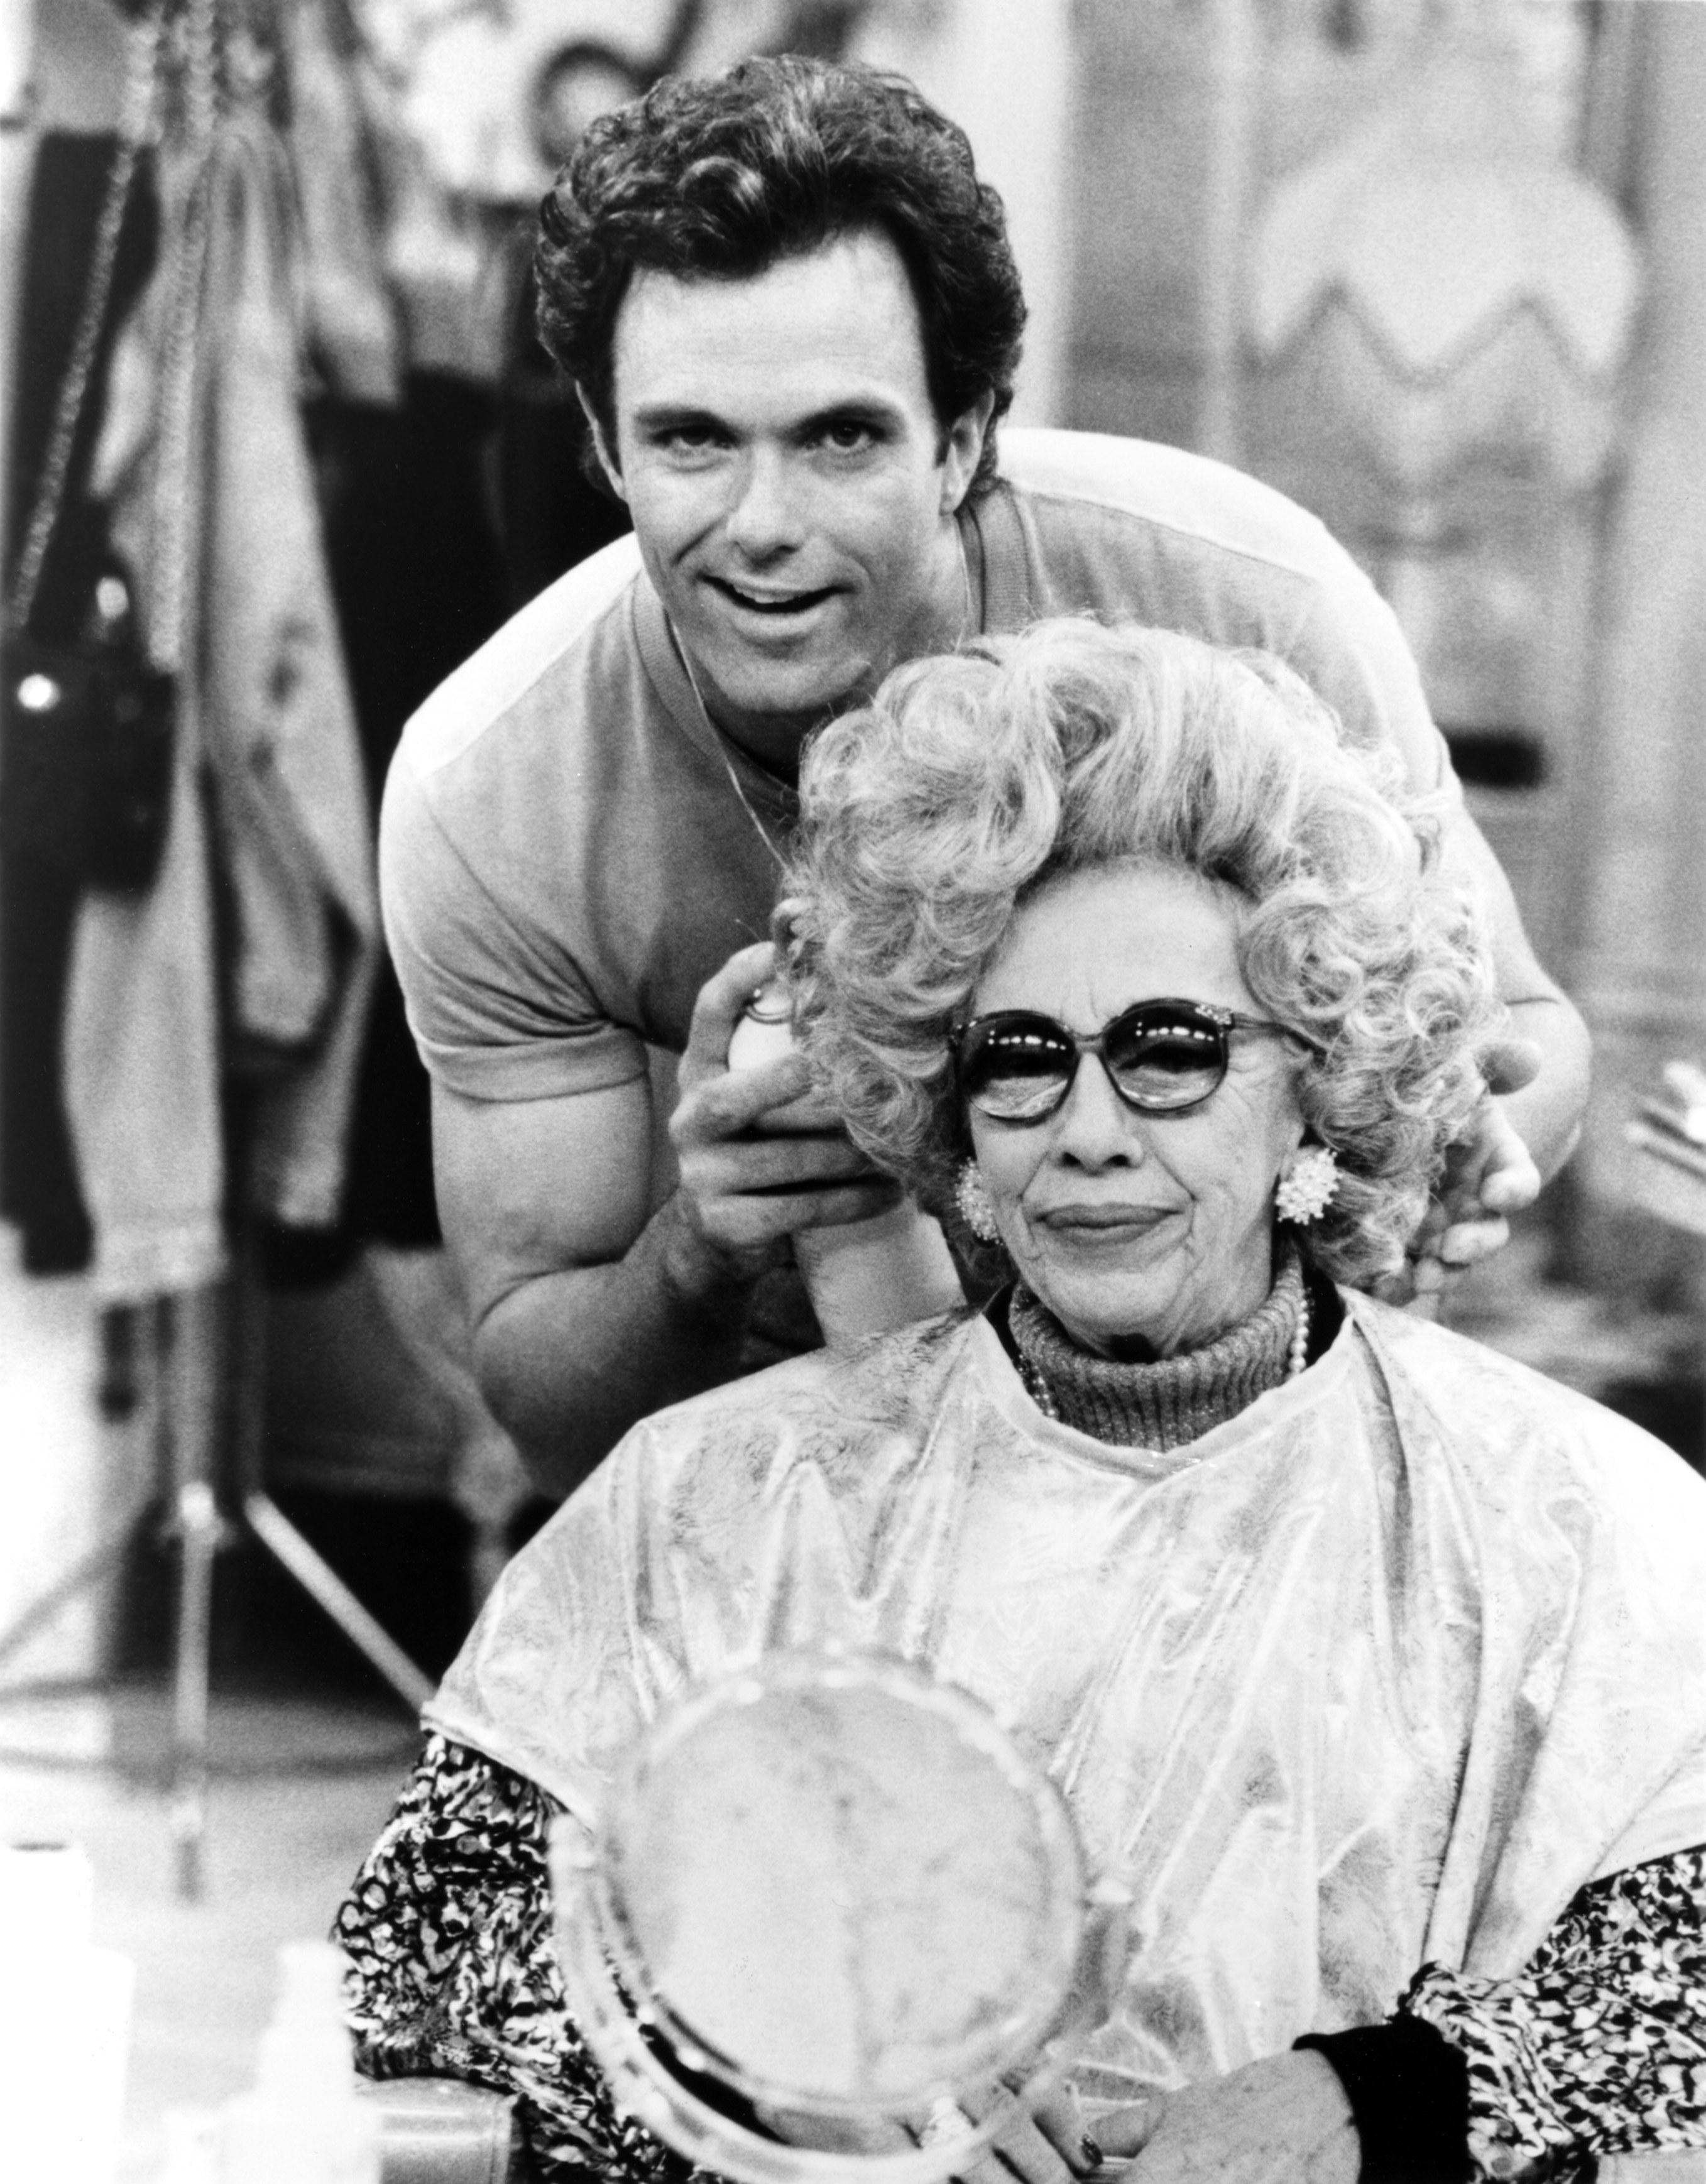 Man doing a woman's hair at a salon